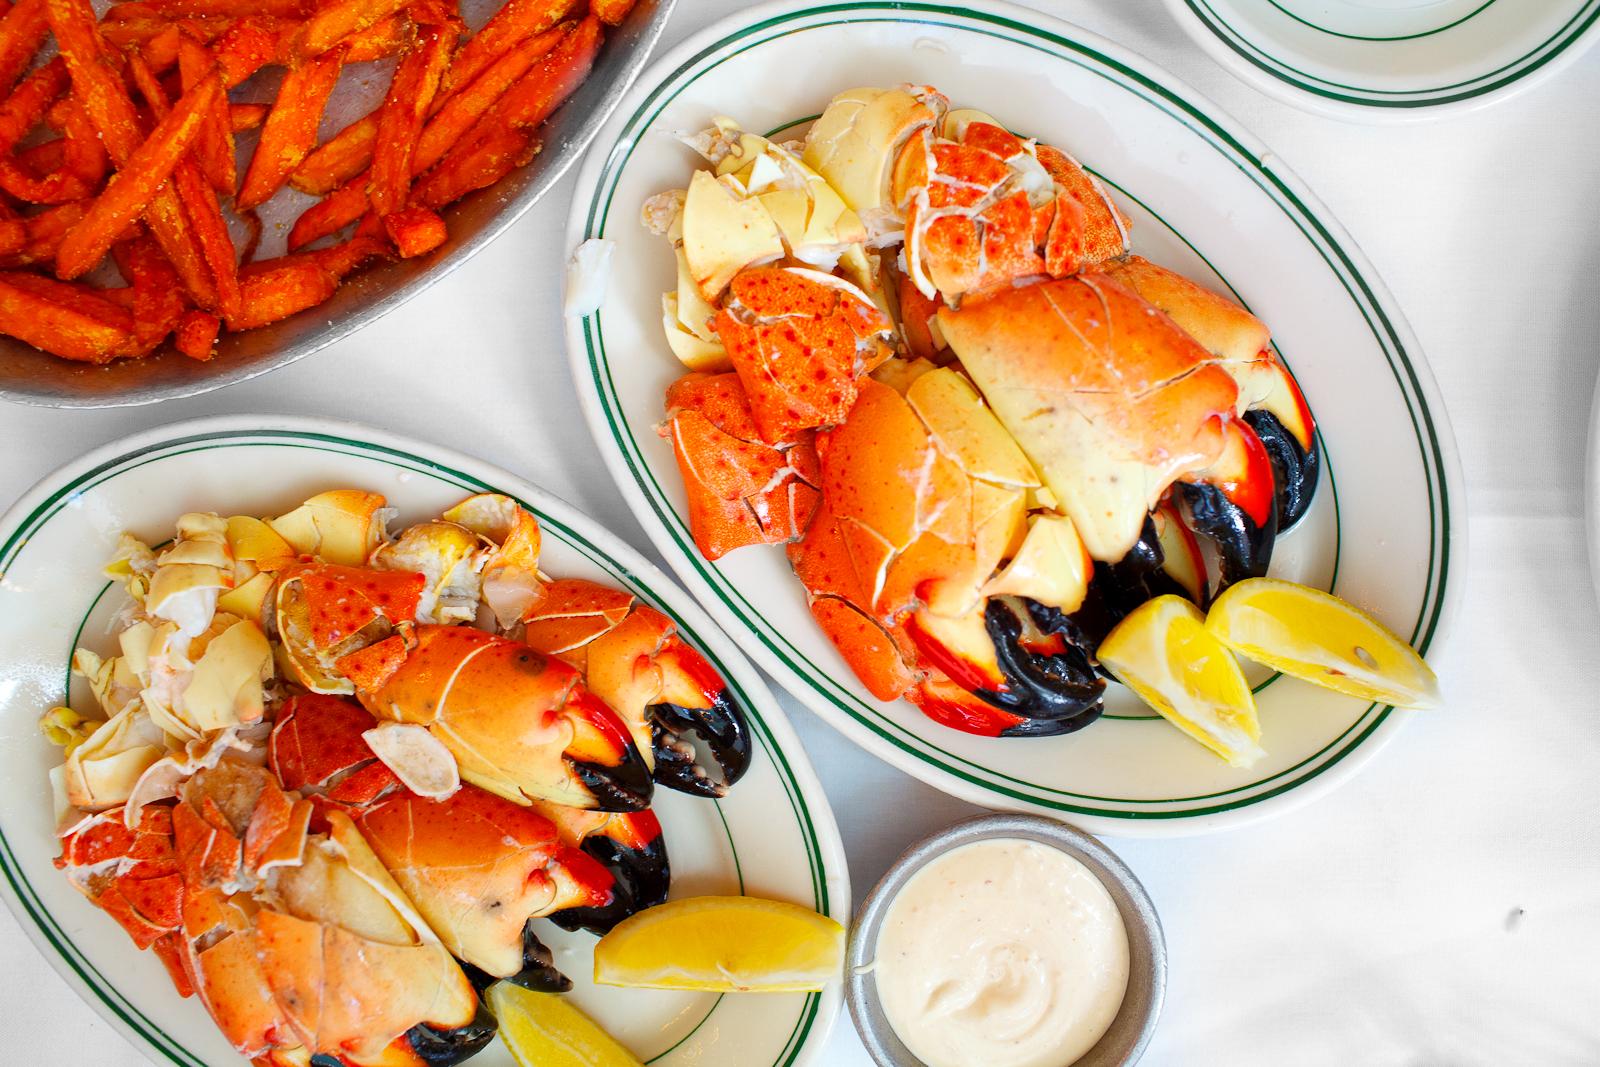 Large stone crabs ($48.95) and medium stone crabs ($25.95)